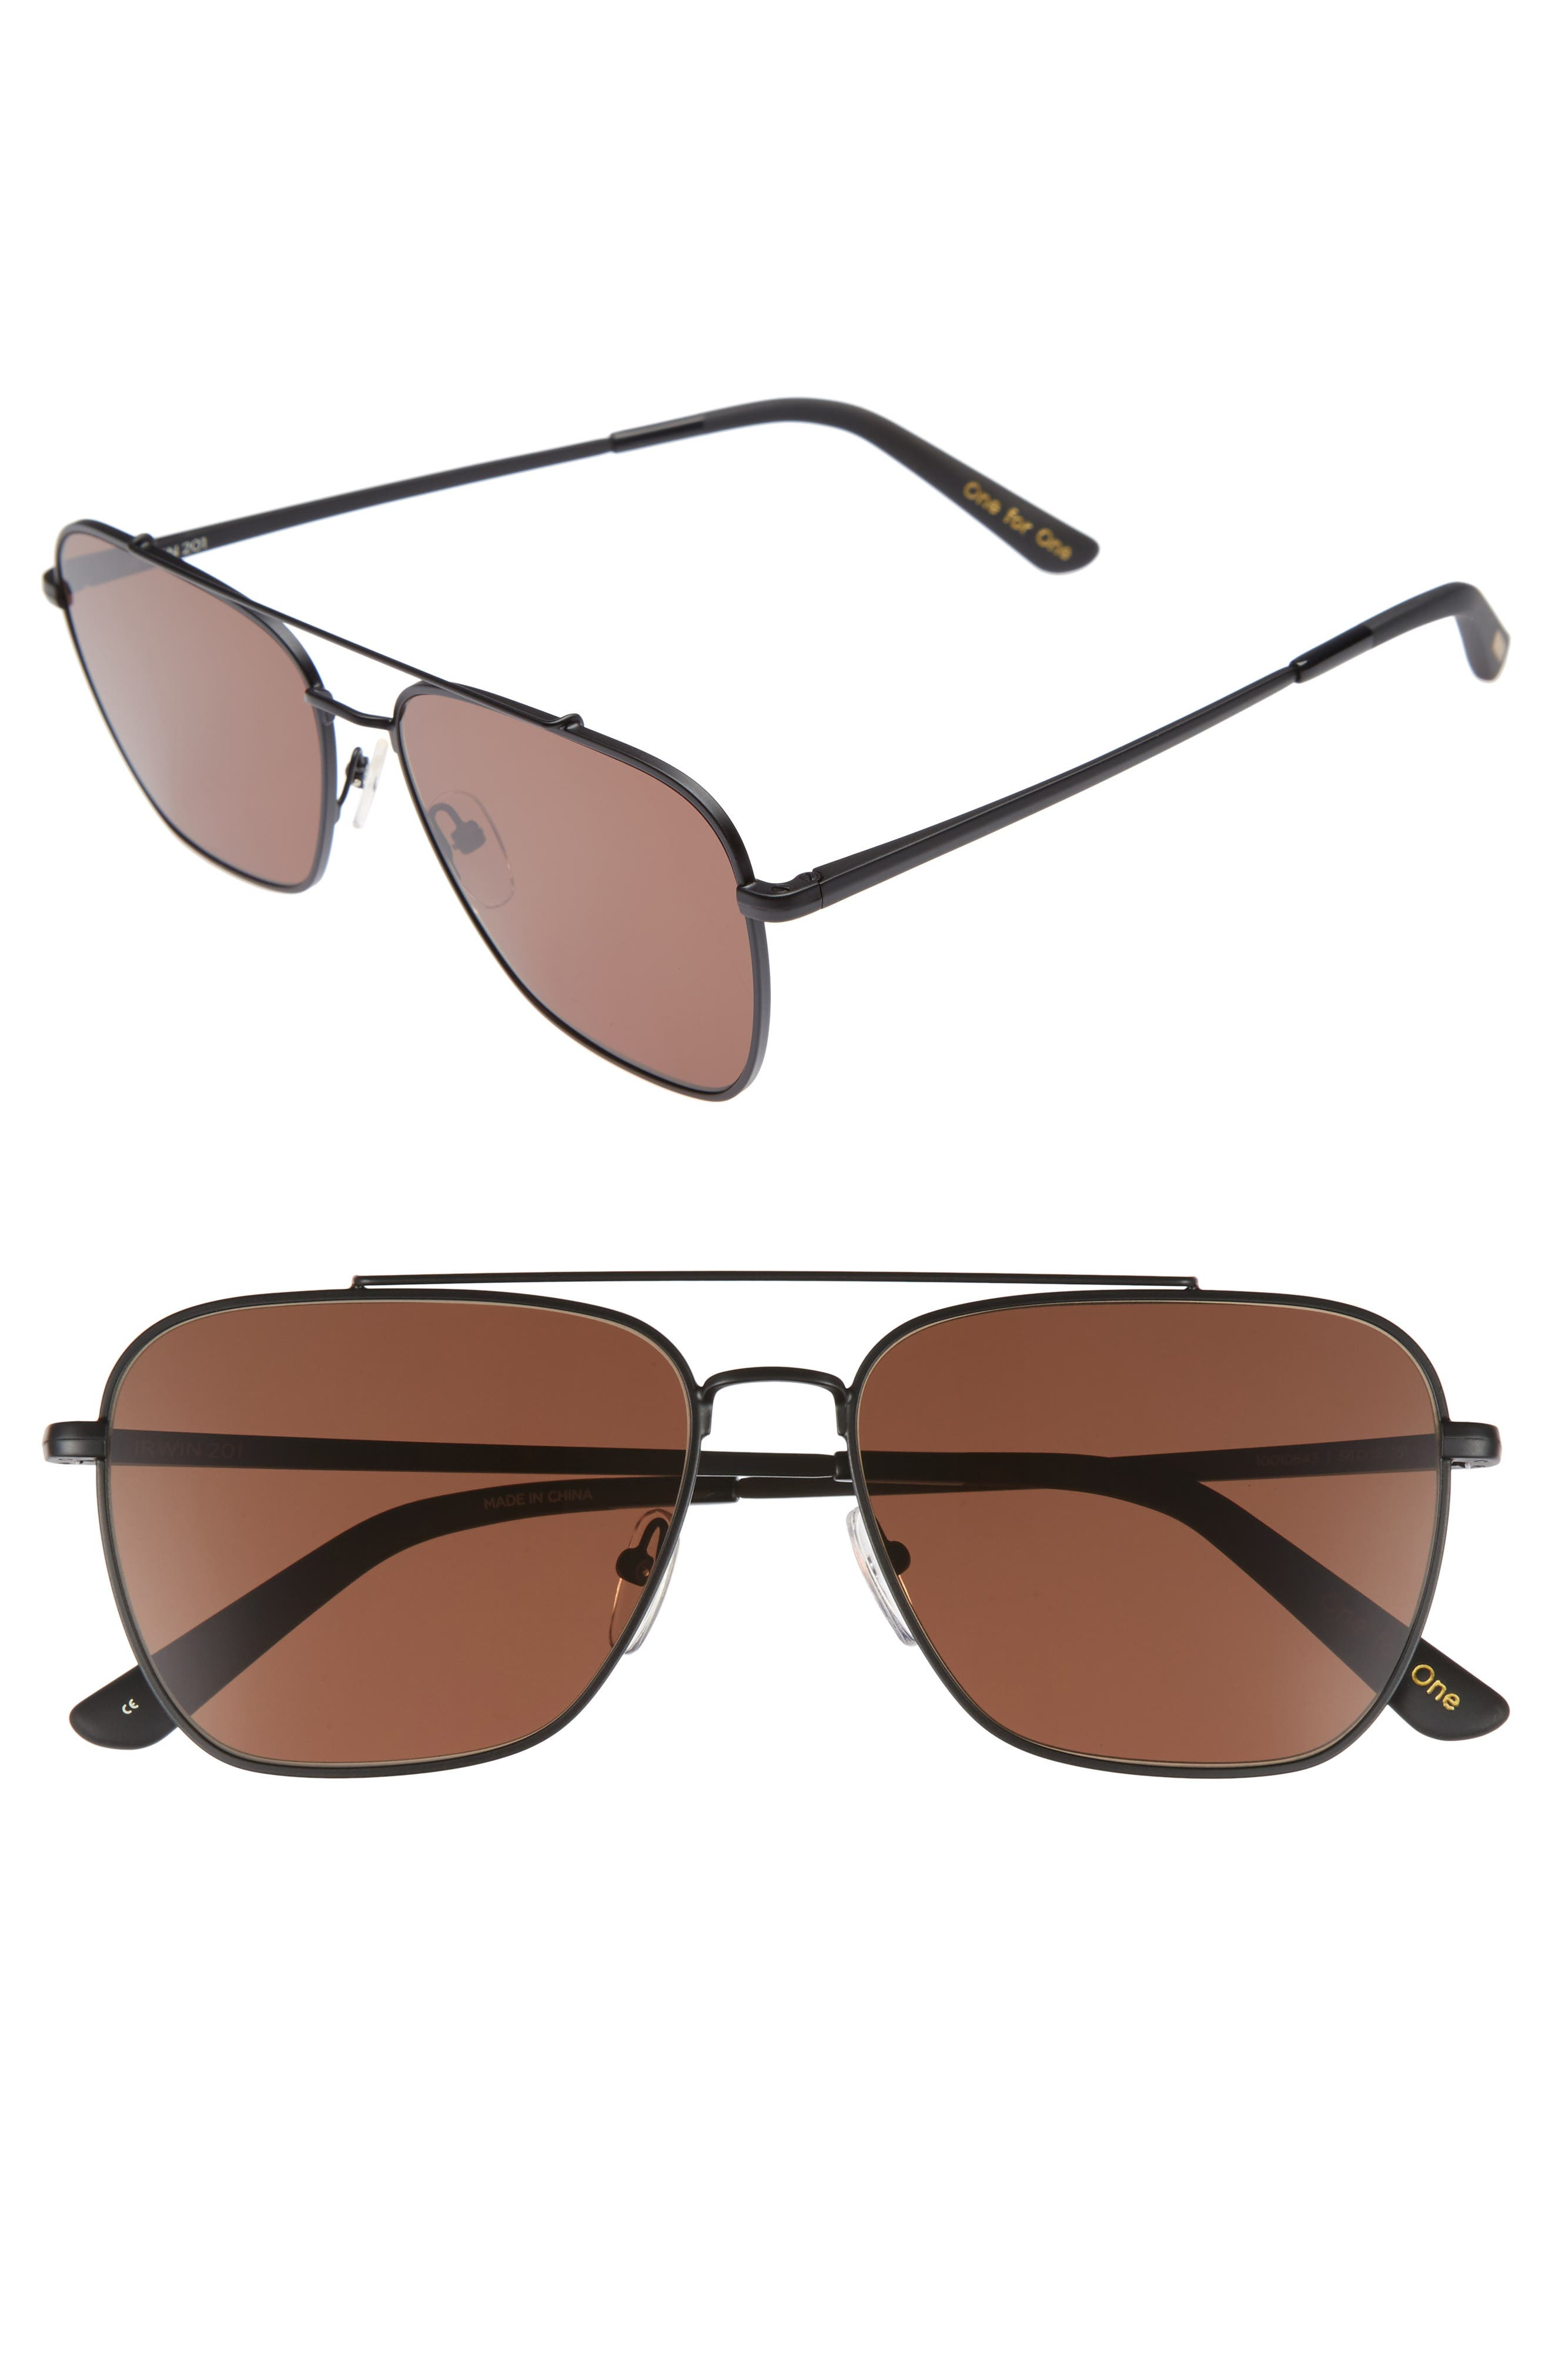 Irwin 58mm Sunglasses,                             Main thumbnail 1, color,                             001